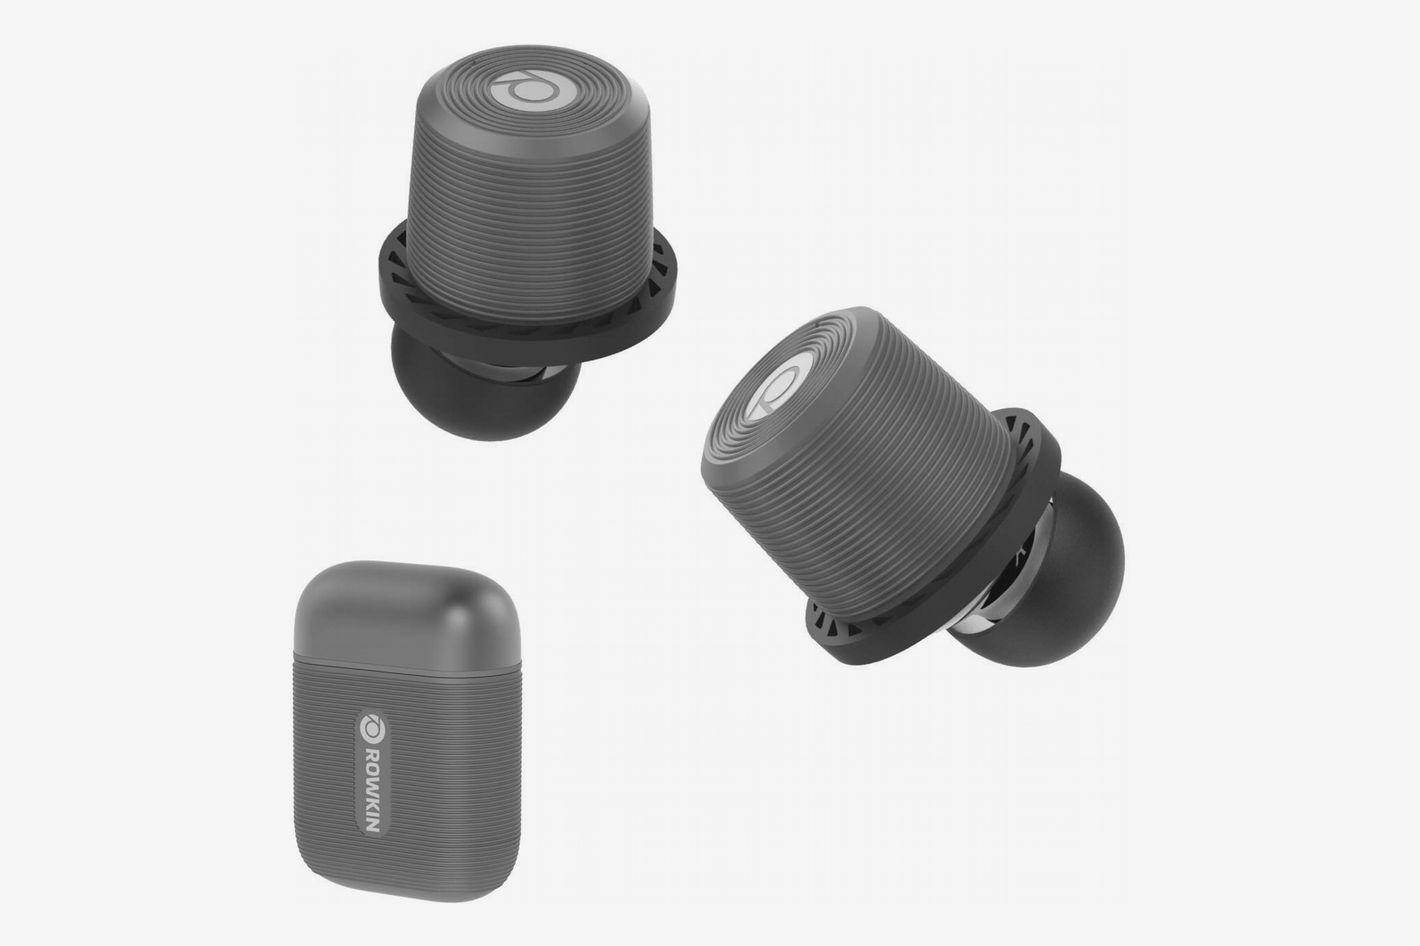 Rowkin Ascent Micro True Wireless Earbuds